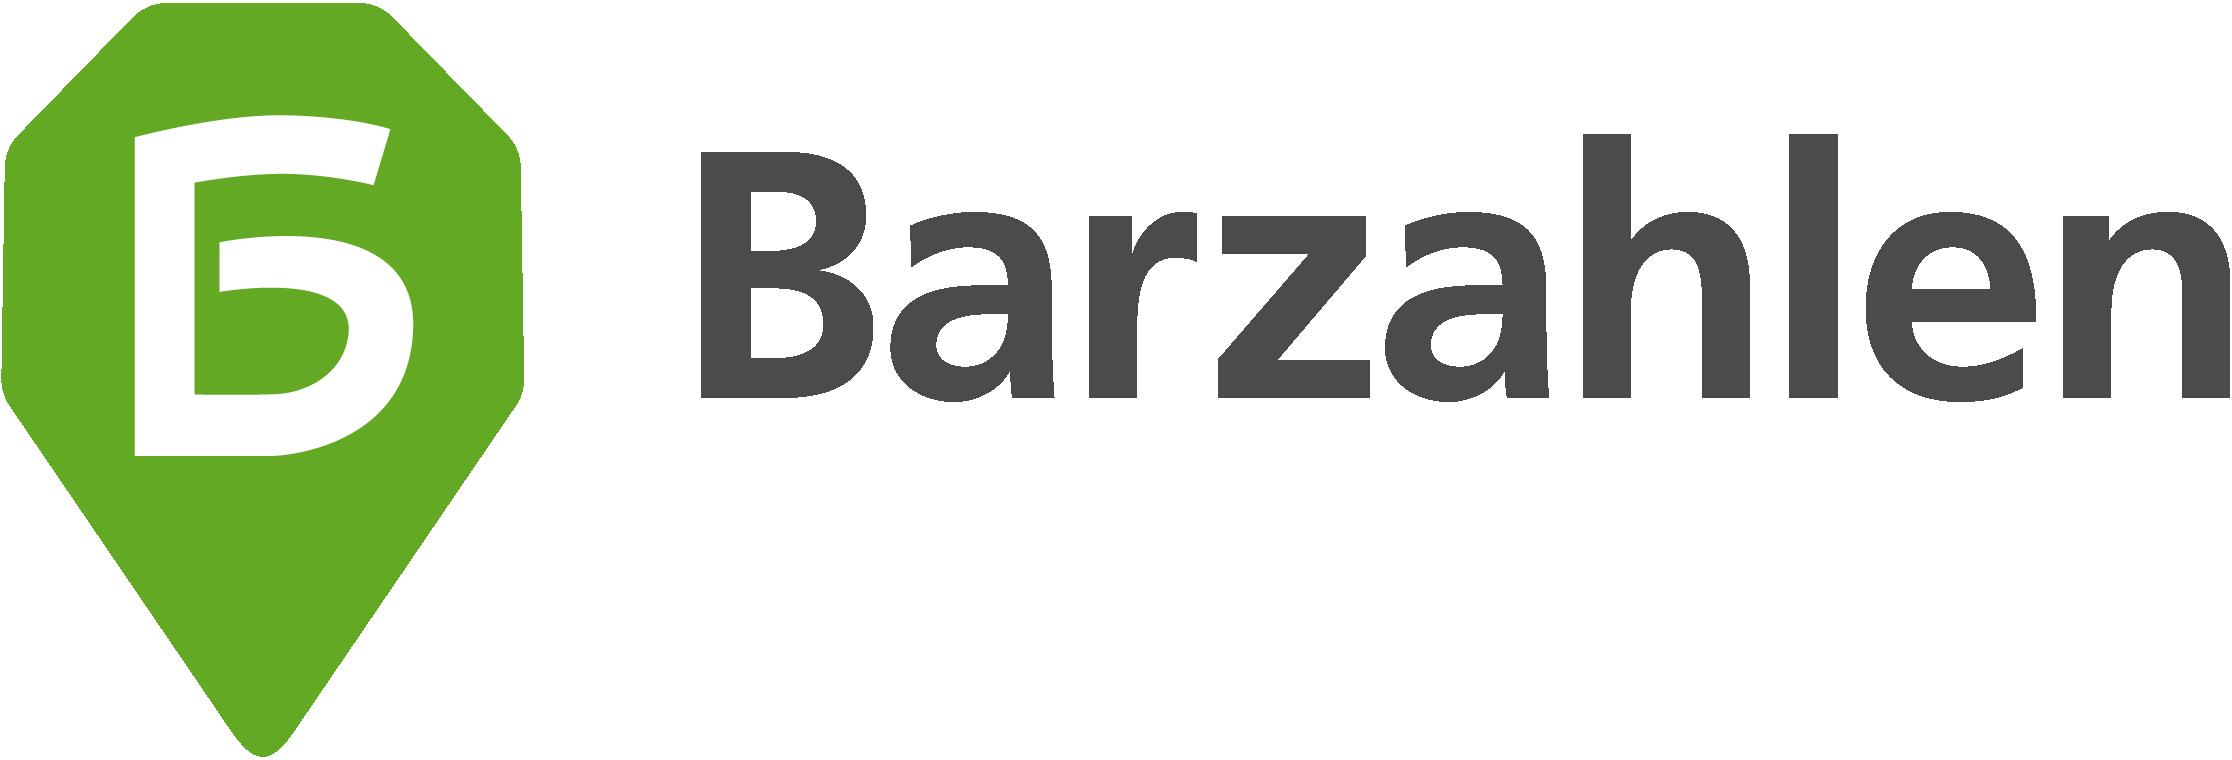 viacash logo